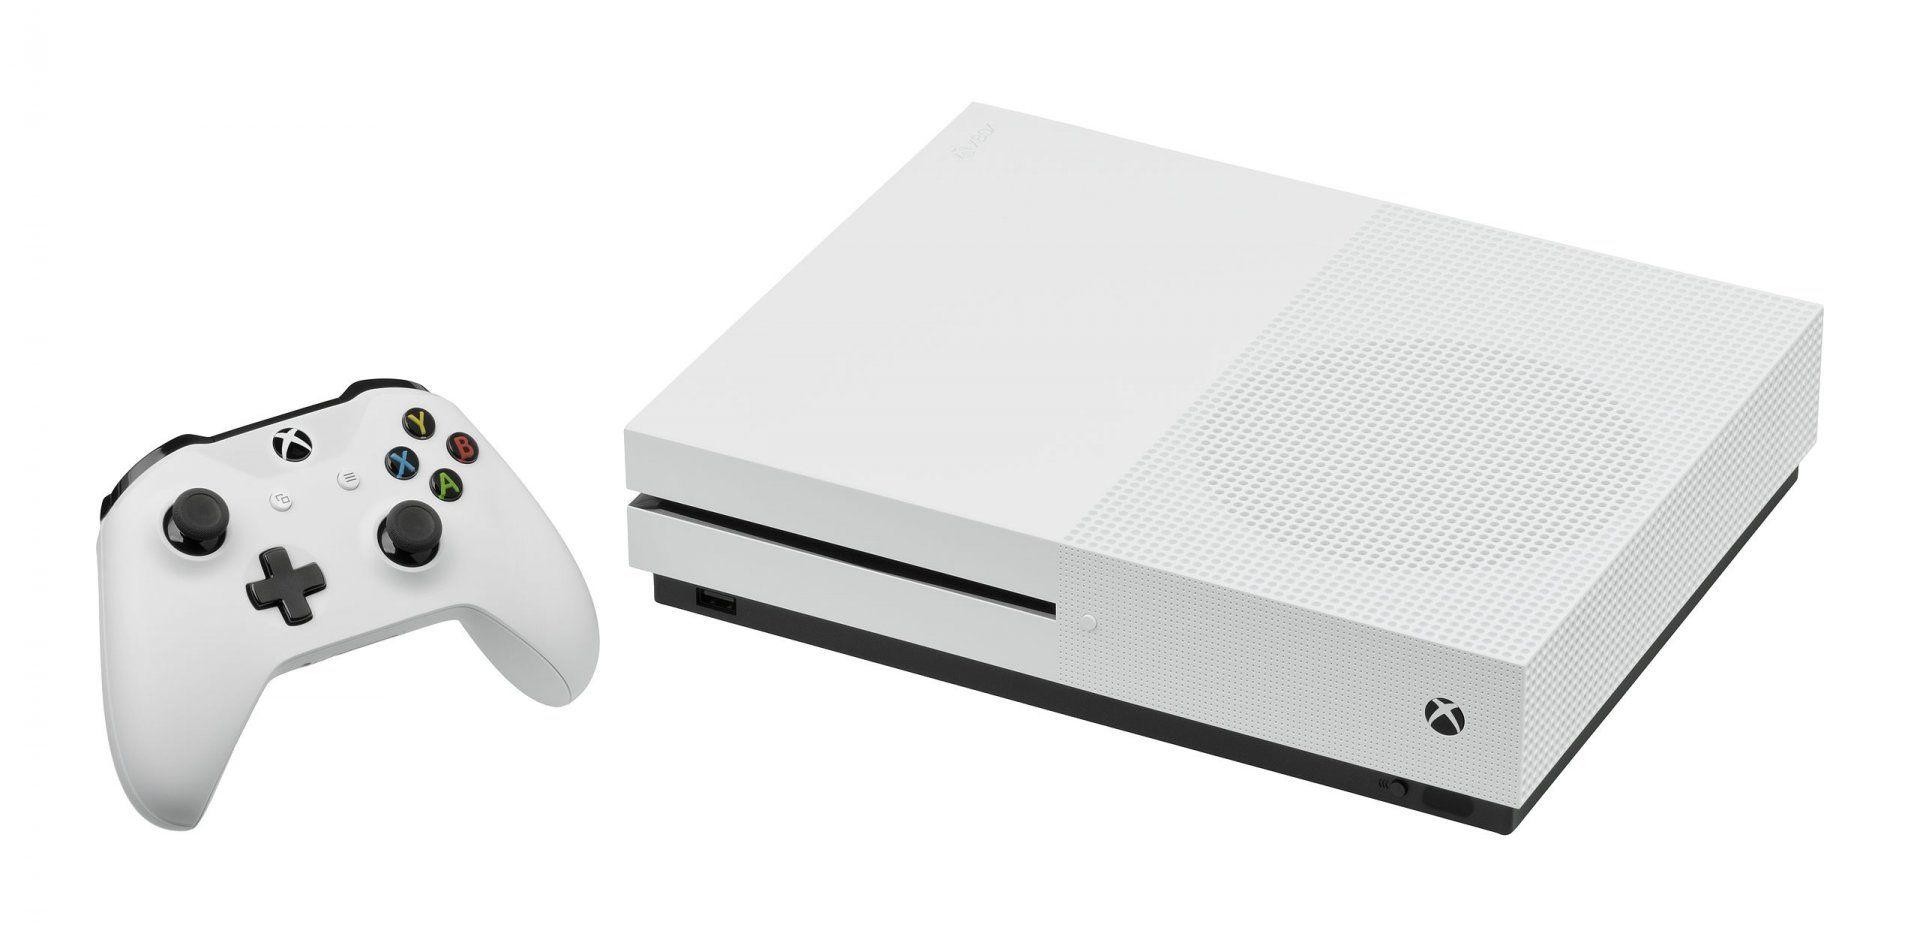 Microsoft-Xbox-One-S-Console-wController-L.jpg